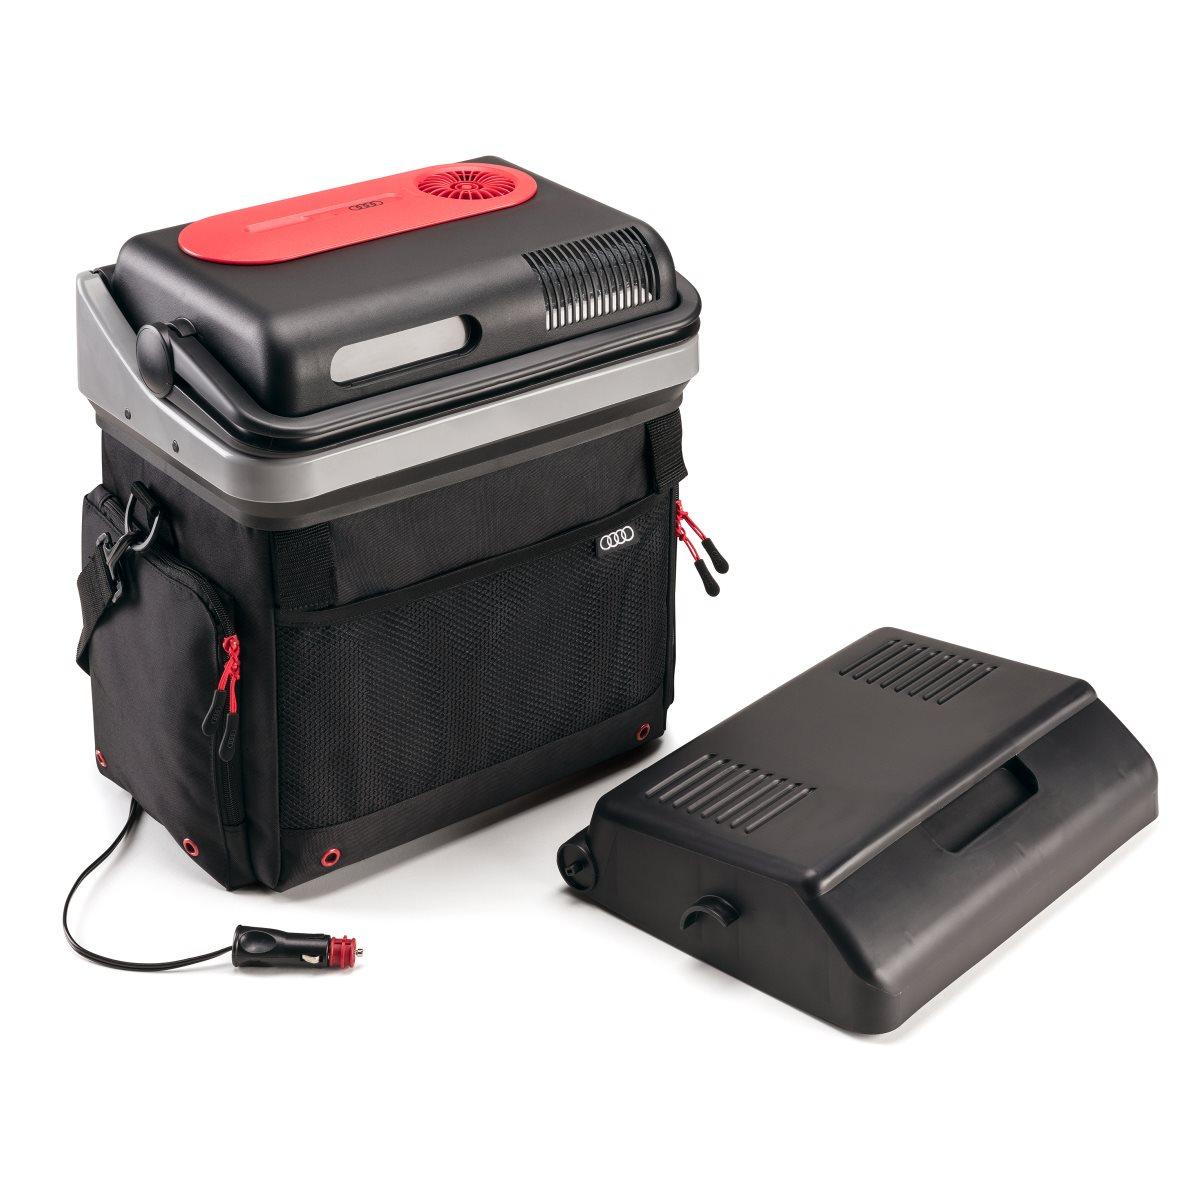 k hltasche original audi k hlbox 4m8065402 thermobox warmhaltebox 20 liter ahw shop vw audi. Black Bedroom Furniture Sets. Home Design Ideas